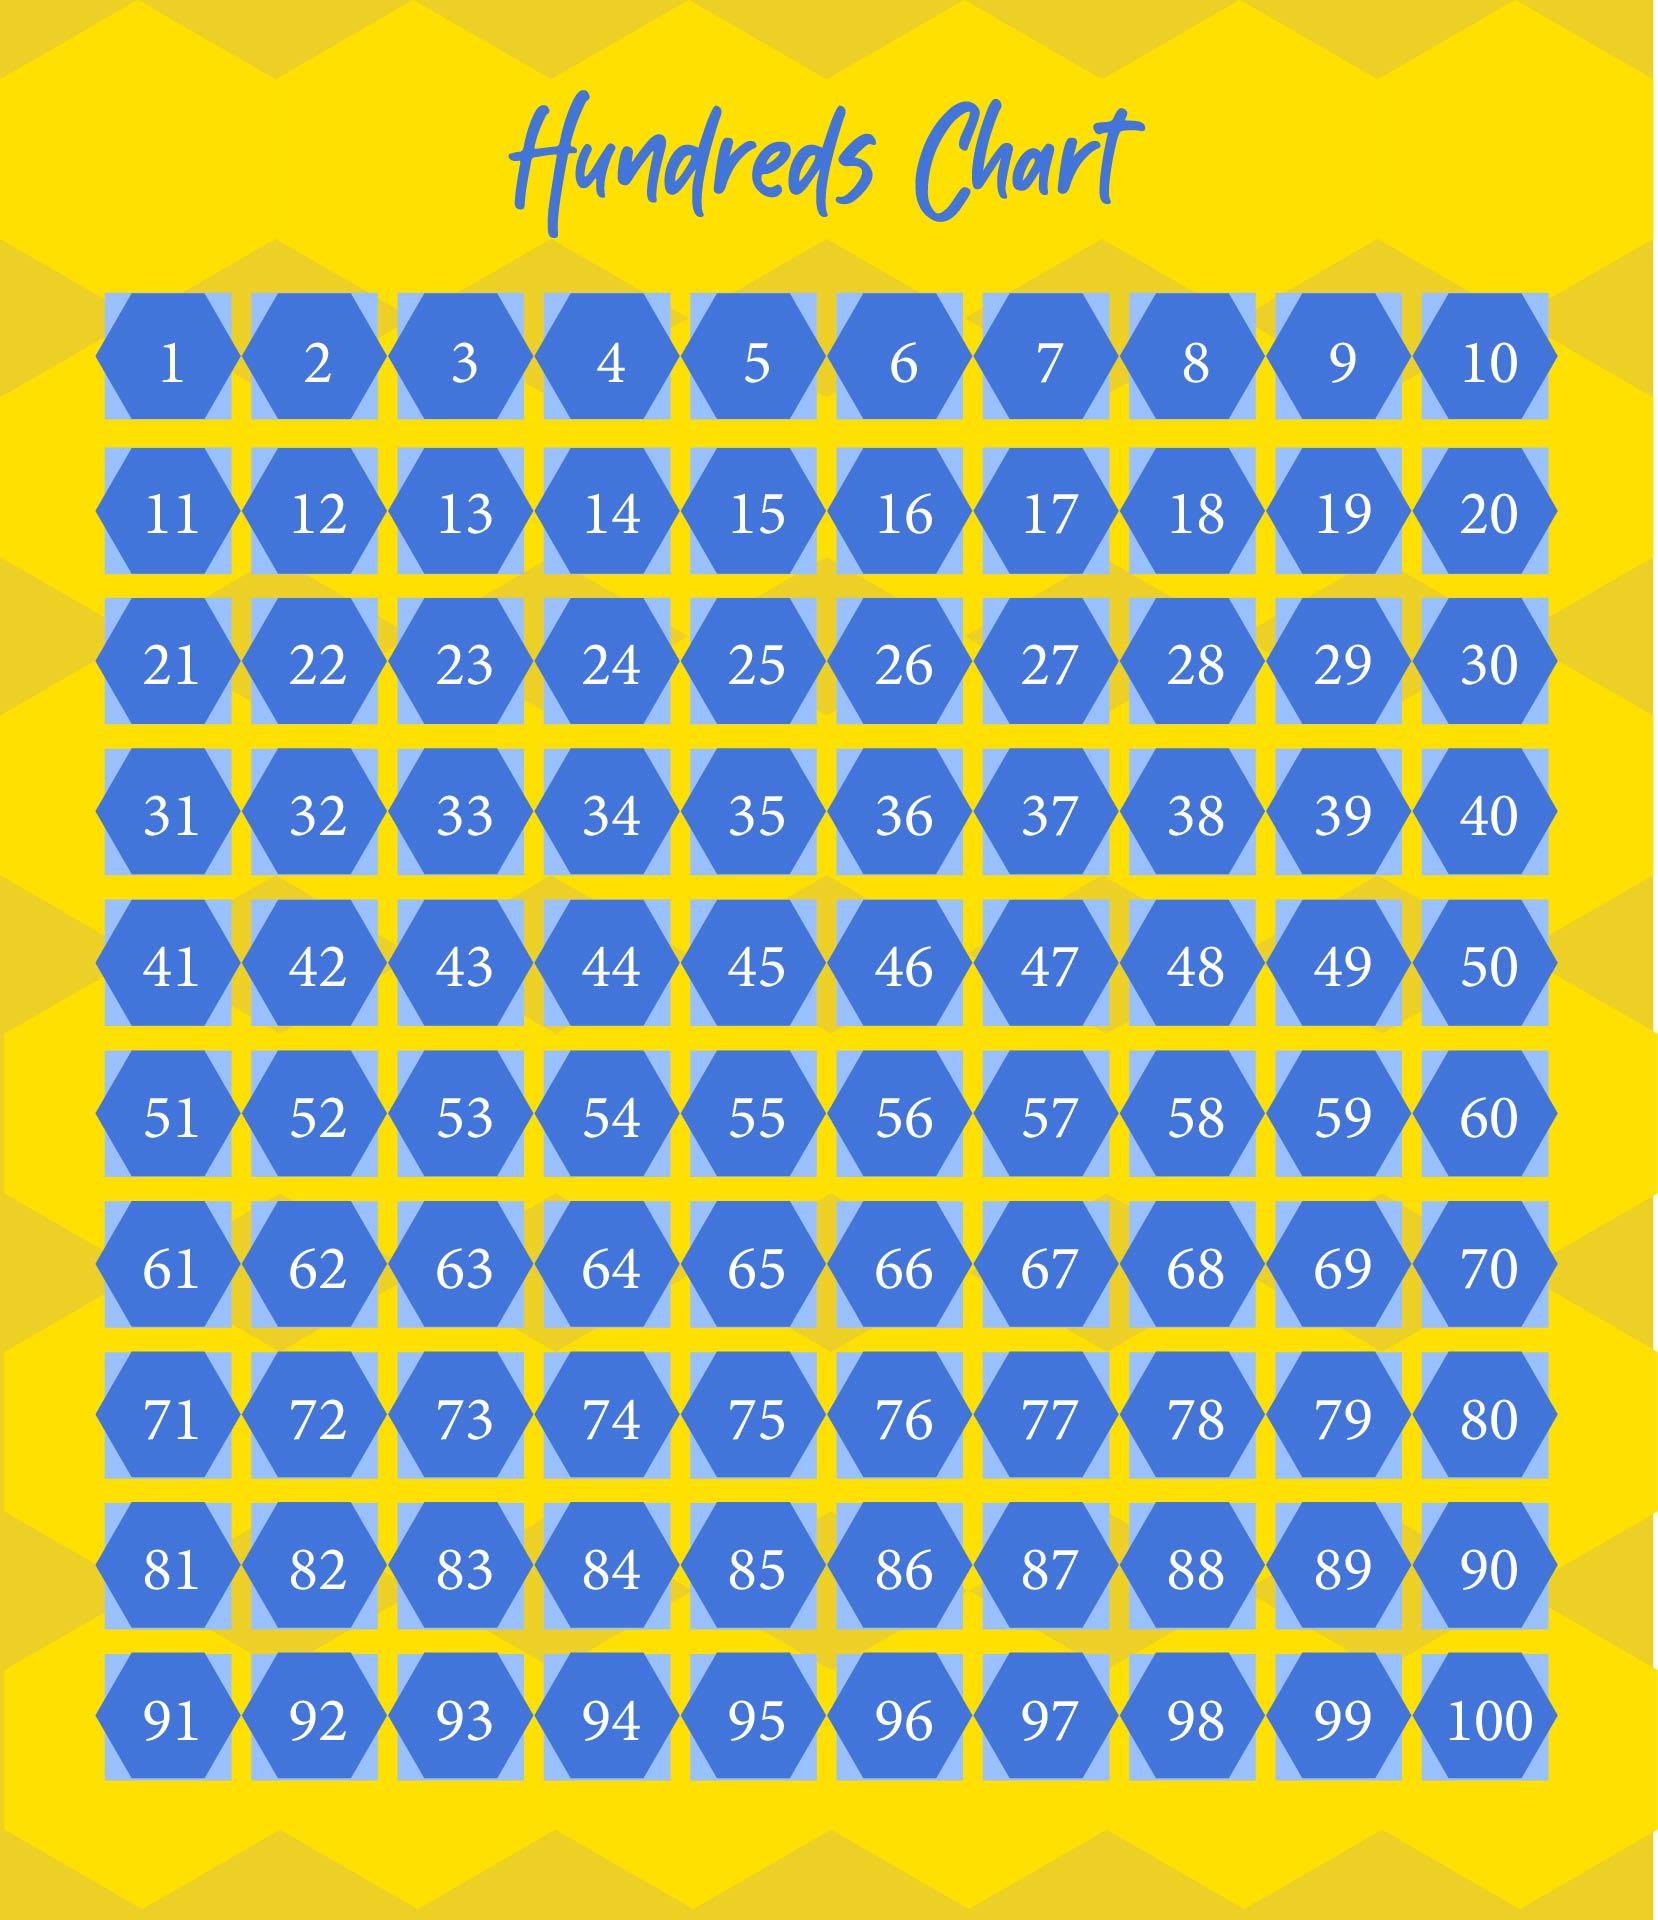 9 Images of Hundreds Chart Printable PDF